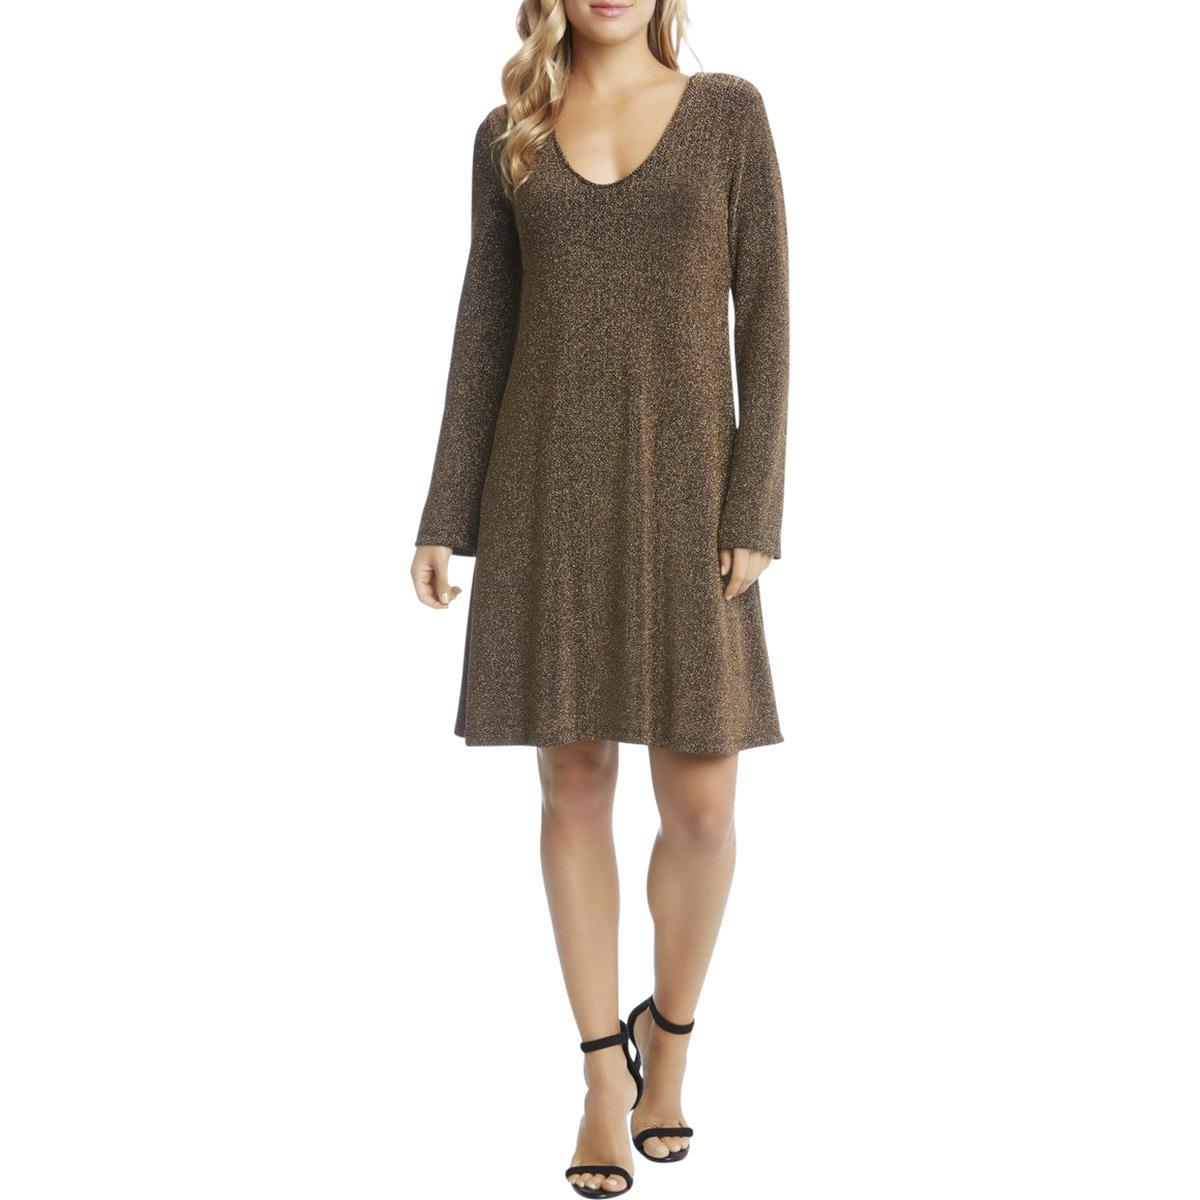 957eb012ad Details about Karen Kane Womens Taylor Gold Metallic V-Neck Party Dress S  BHFO 2057